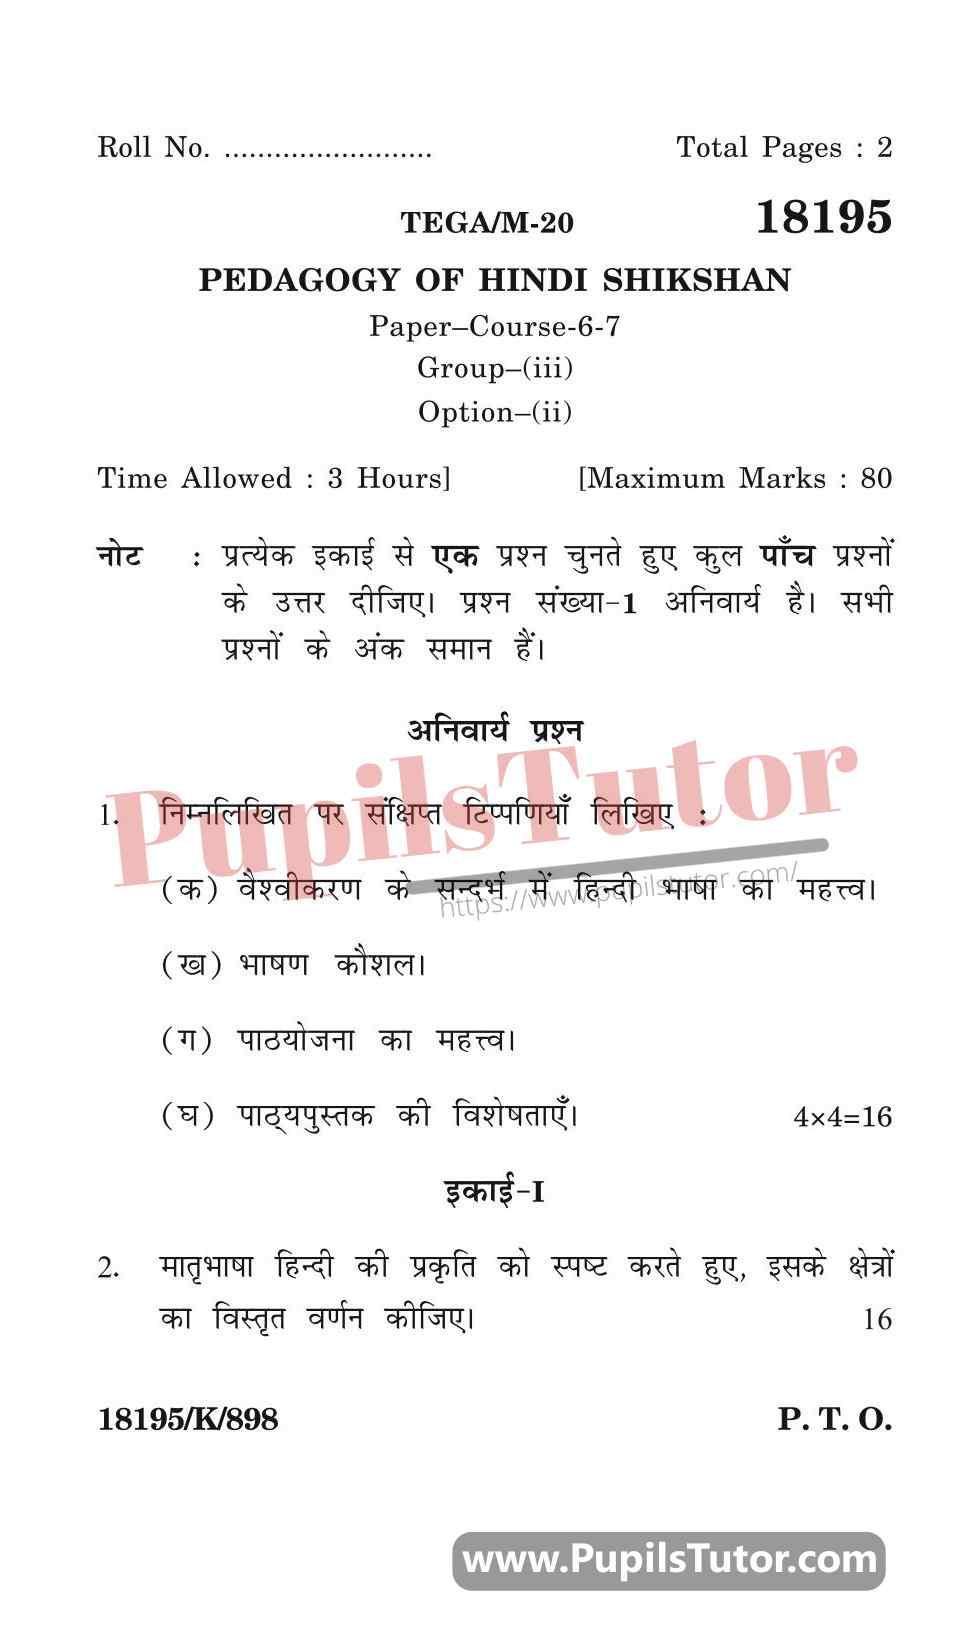 KUK (Kurukshetra University, Haryana) Pedagogy Of Hindi Shikshan Question Paper 2020 For B.Ed 1st And 2nd Year And All The 4 Semesters Free Download PDF - Page 1 - Pupils Tutor